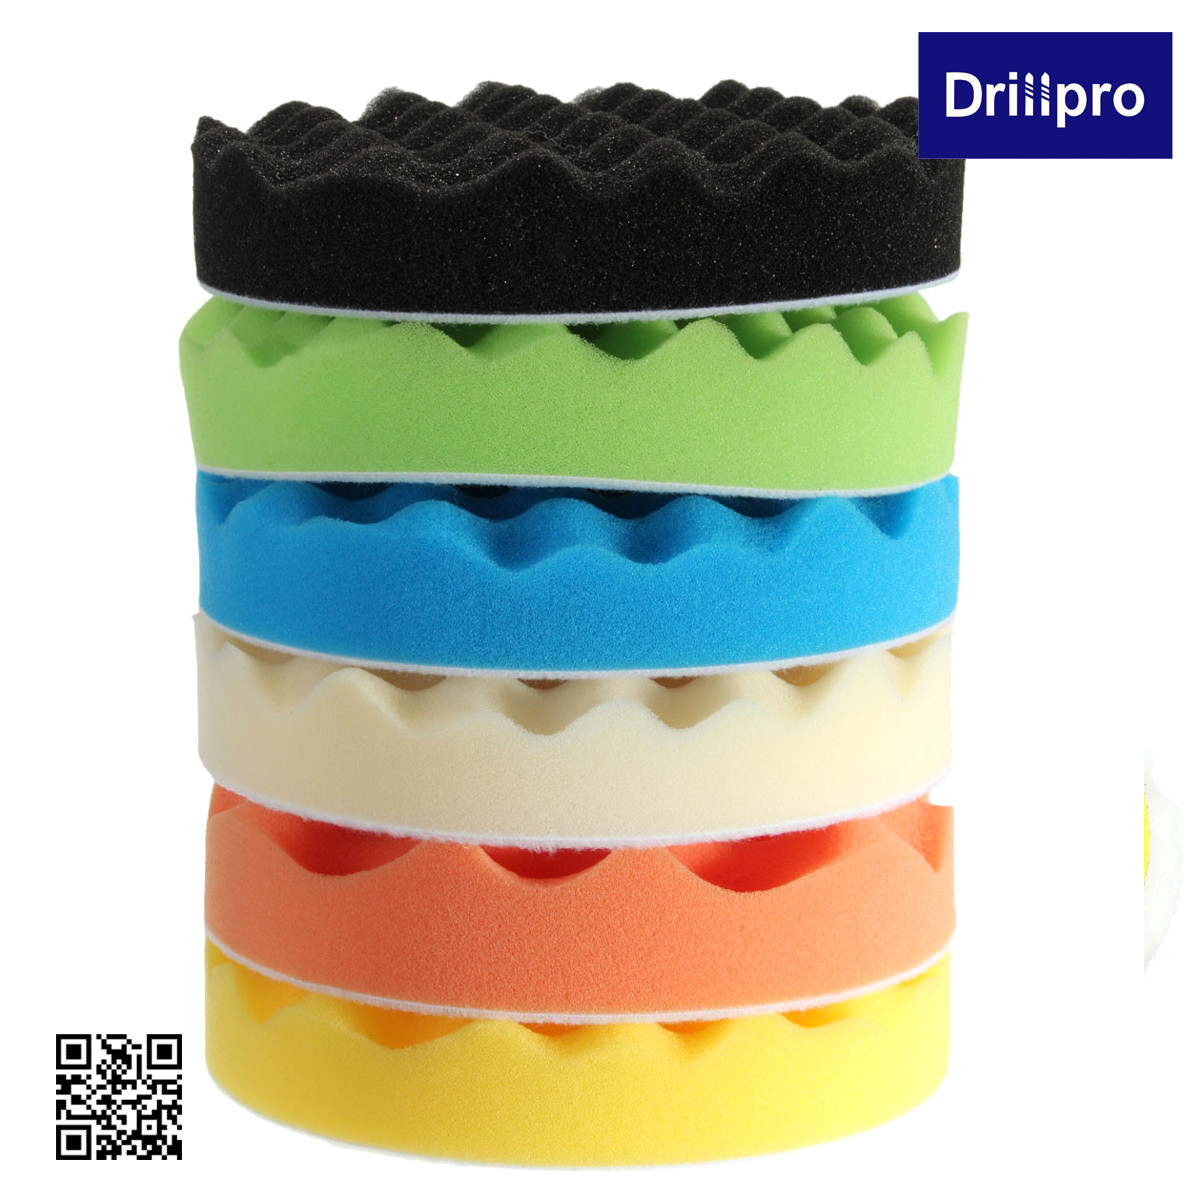 Drillpro 8x 6'' 150mm Sponge Polishing Waxing Buffing Pads Kit Compound Auto Car